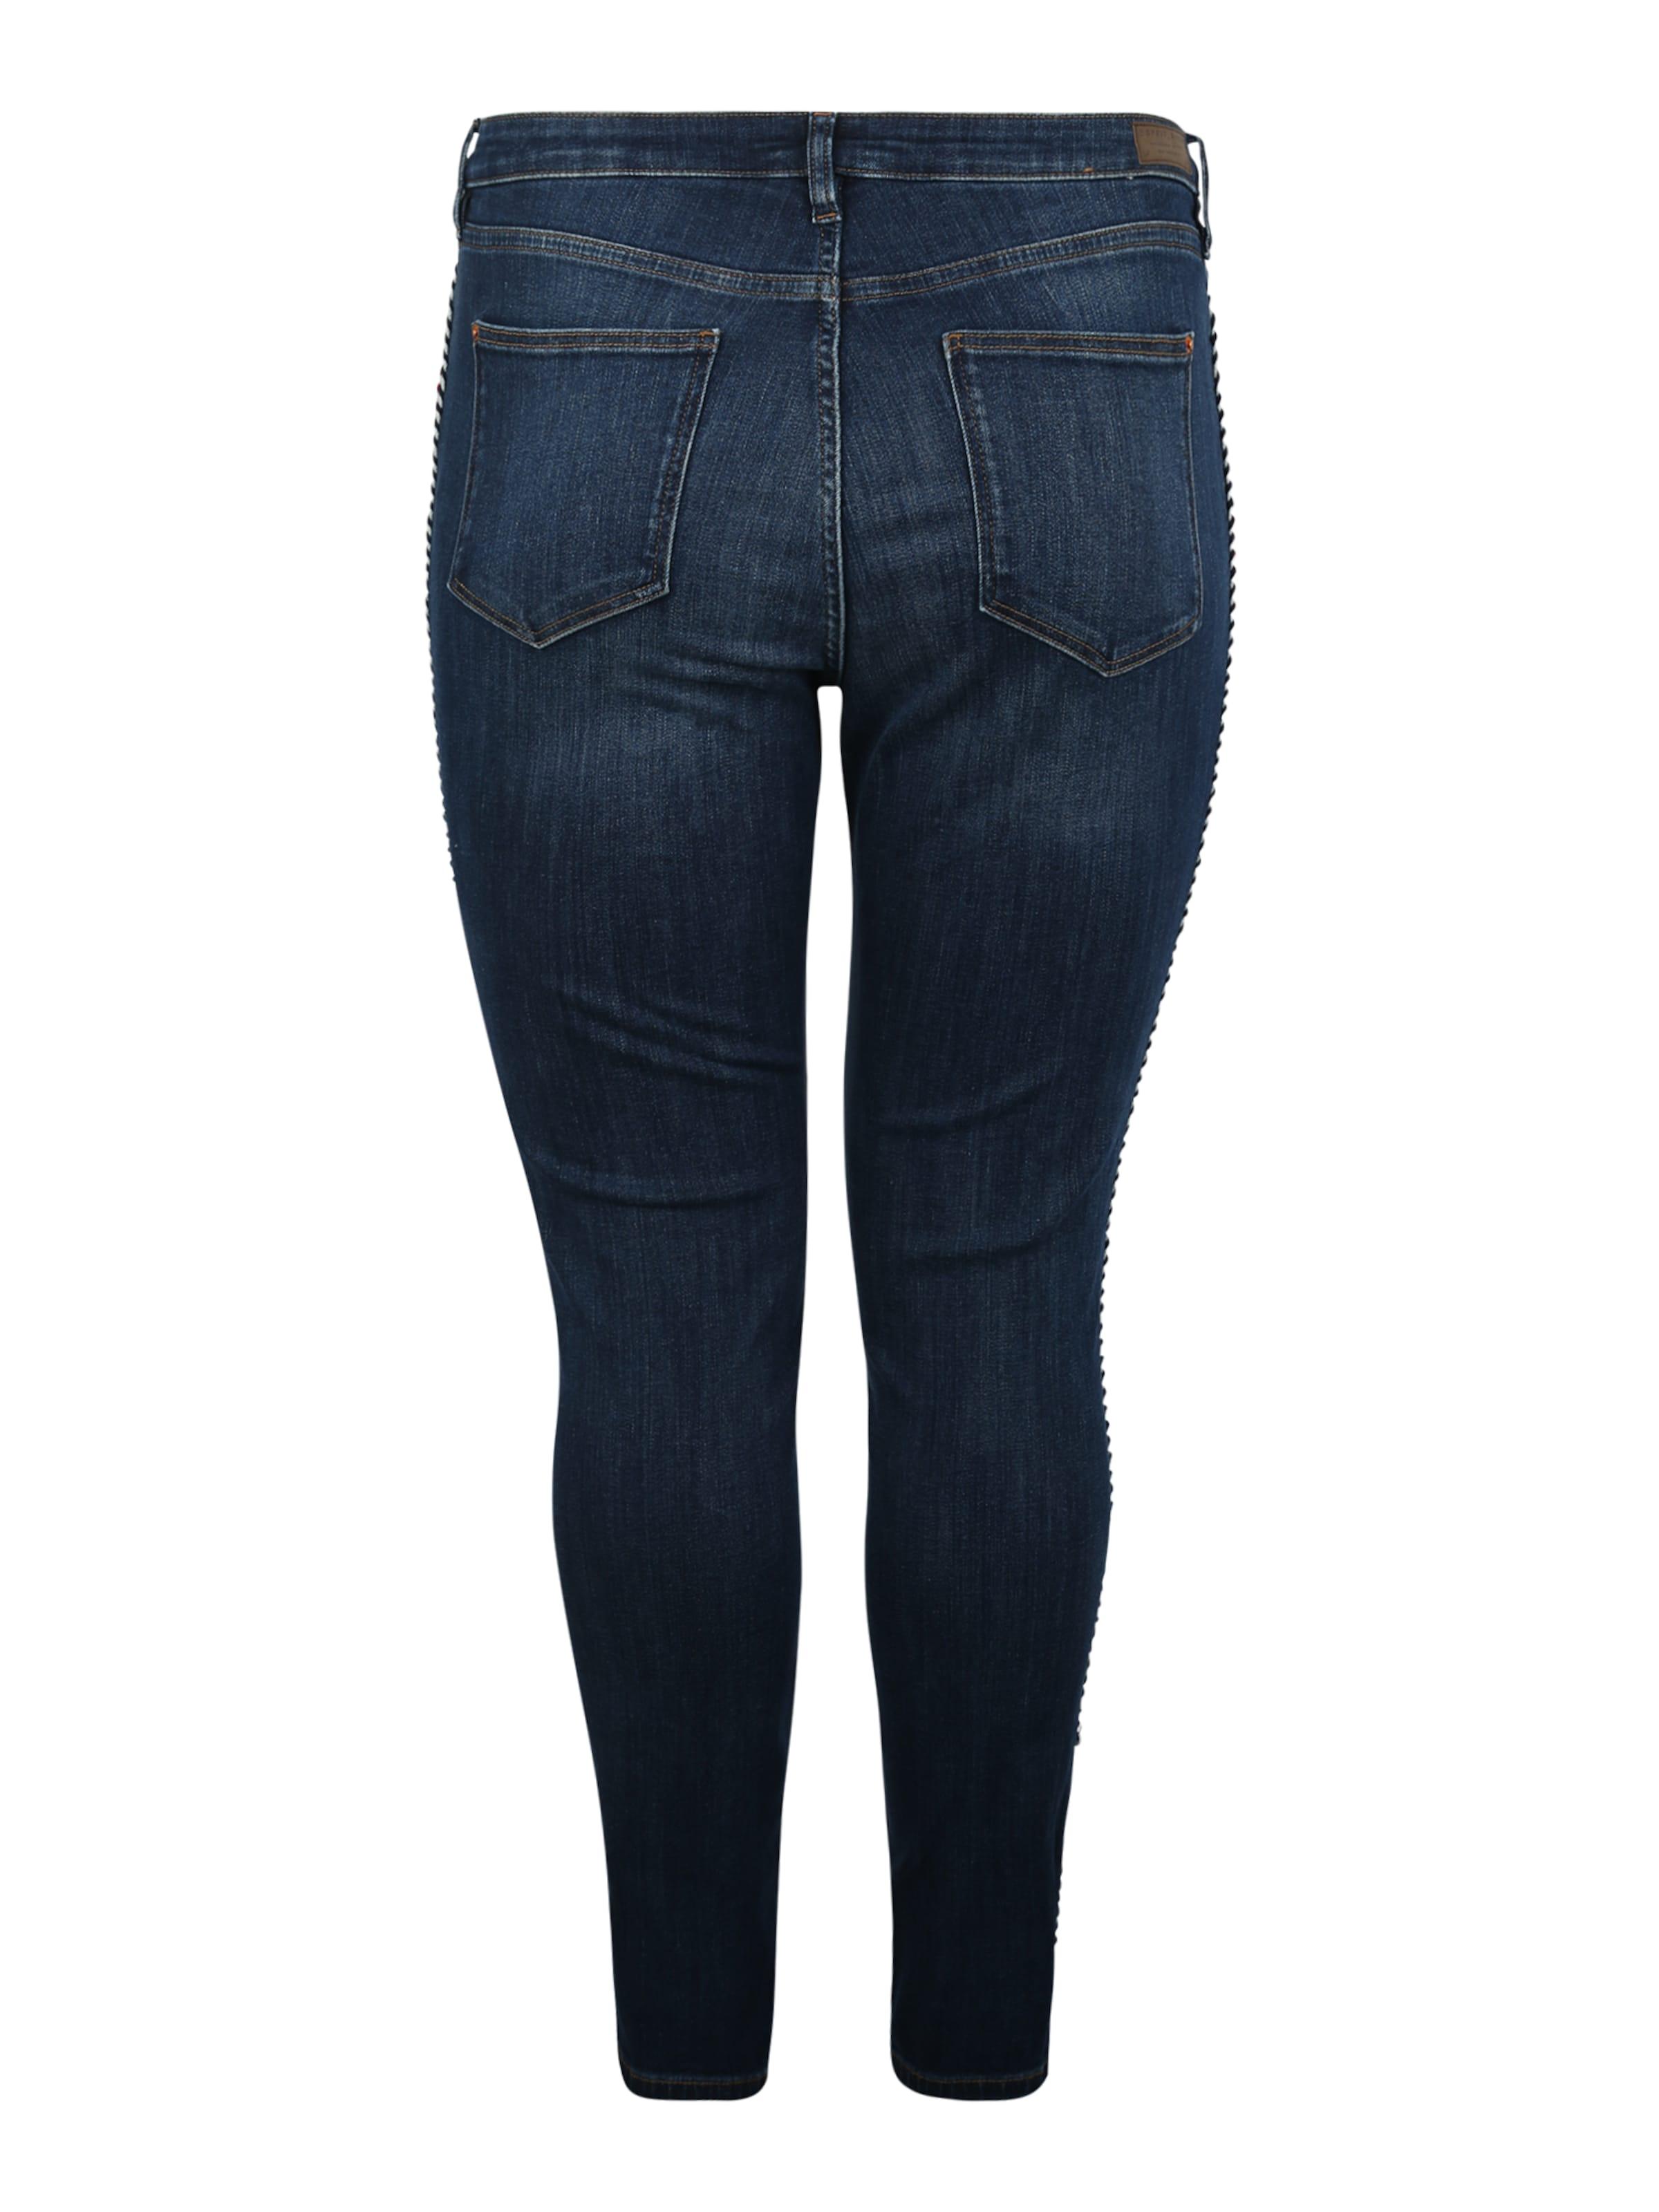 Esprit Denim In Blue Curves Jeans 6bf7yYg